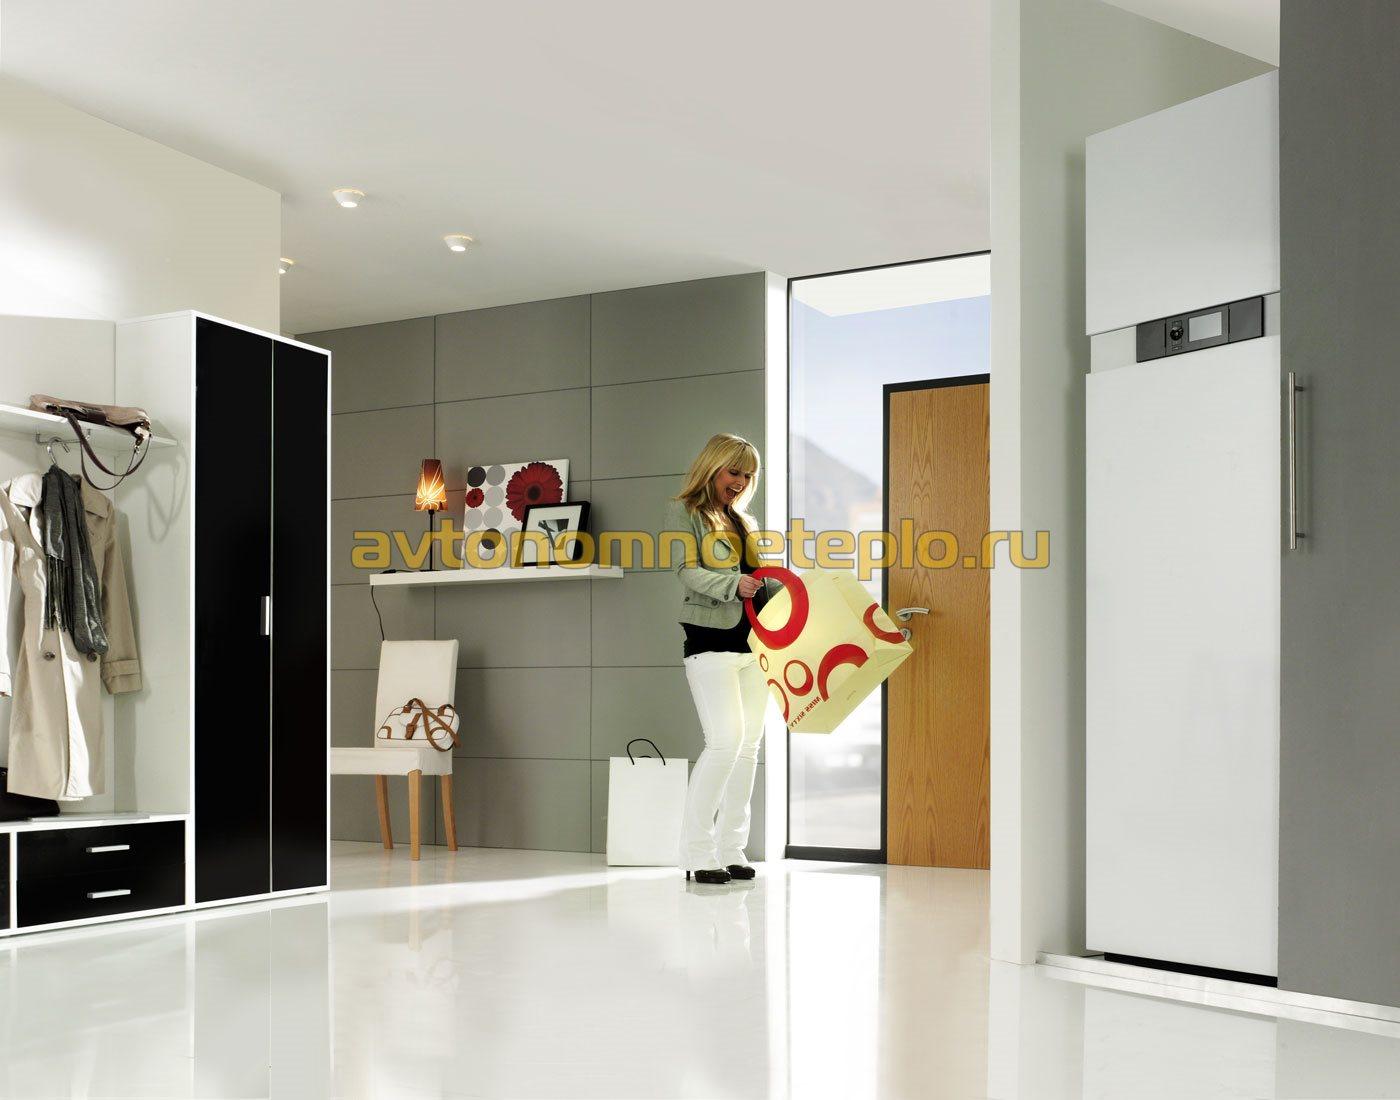 chaudiere micro cogeneration gaz viessmann devis contact artisan champigny sur marne. Black Bedroom Furniture Sets. Home Design Ideas